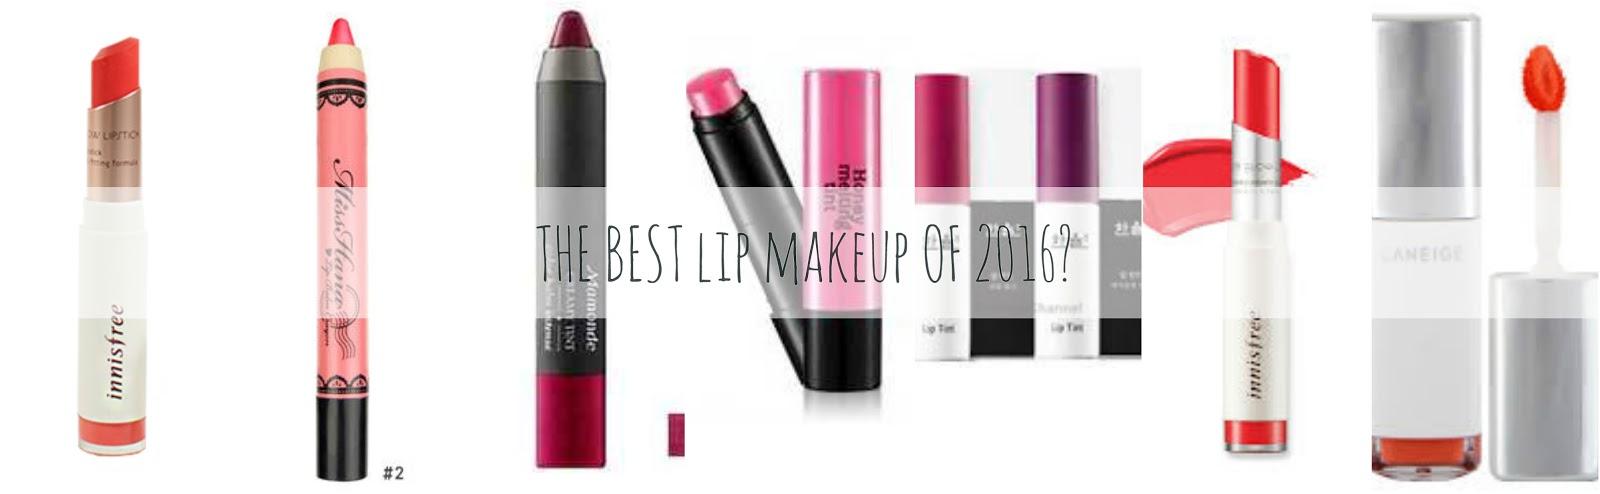 Carolyns Lavender Garden Best Of Beauty 2016 My Laneige Lip Eye Make Up Remover Waterproof Ex 25ml Makeup